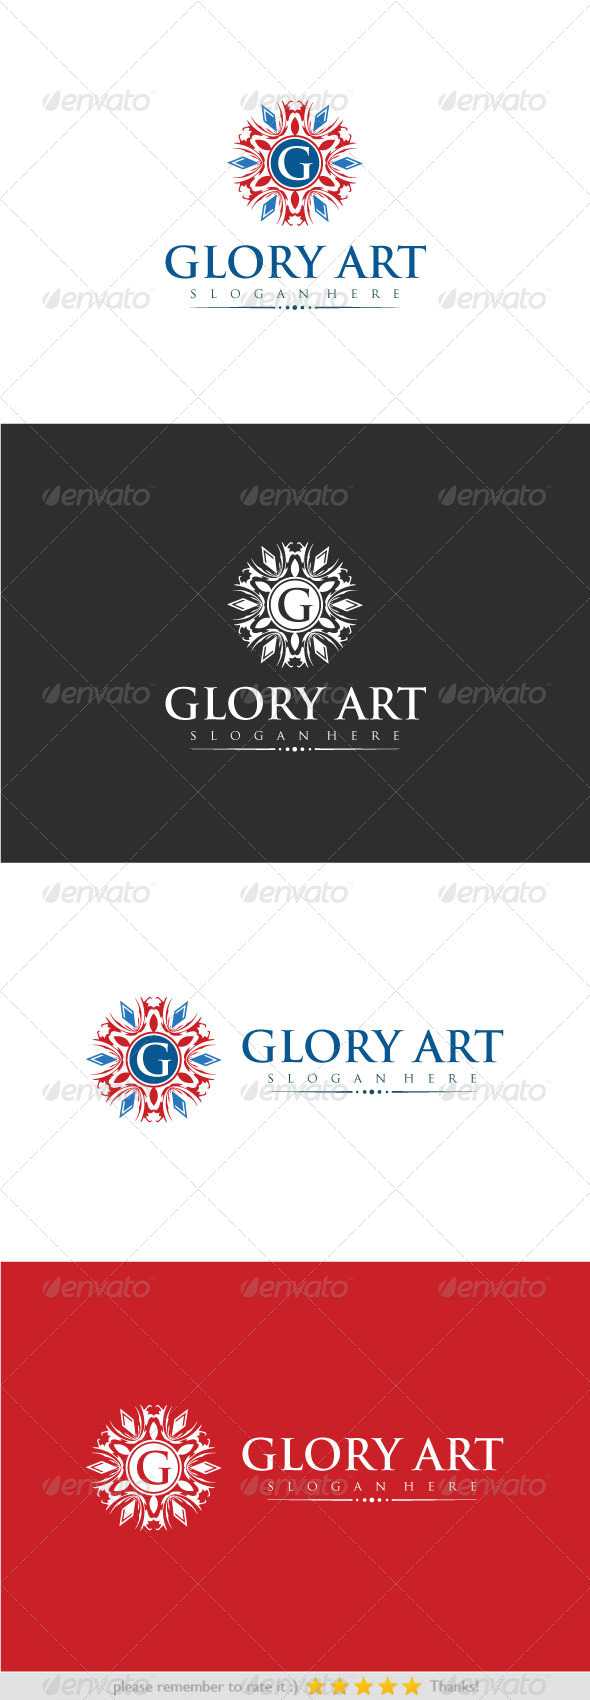 GraphicRiver Glory Art 8276240